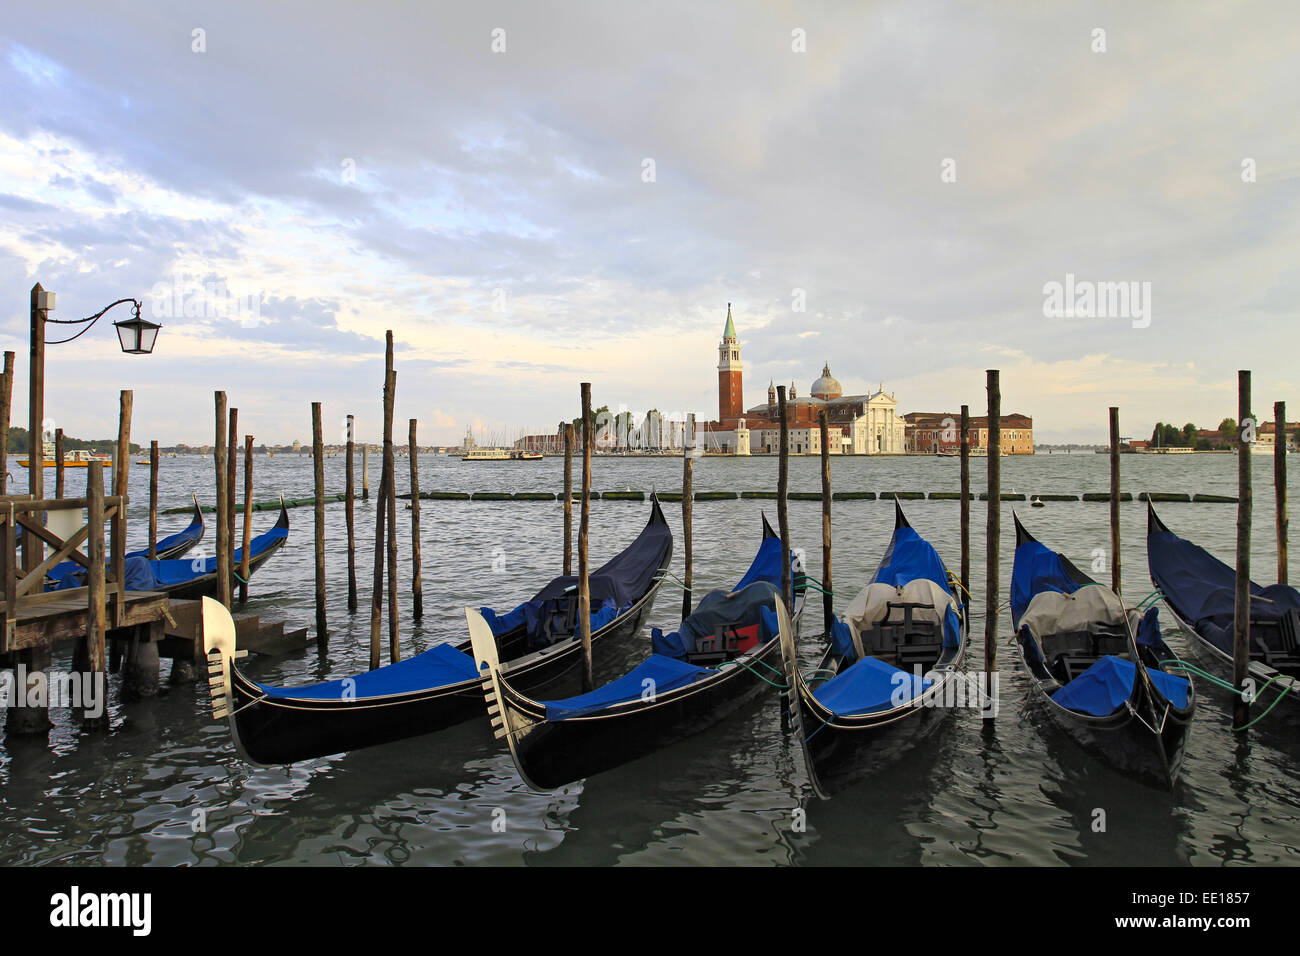 Gondeln am Canale Grande in Venedig, Italien - Stock Image